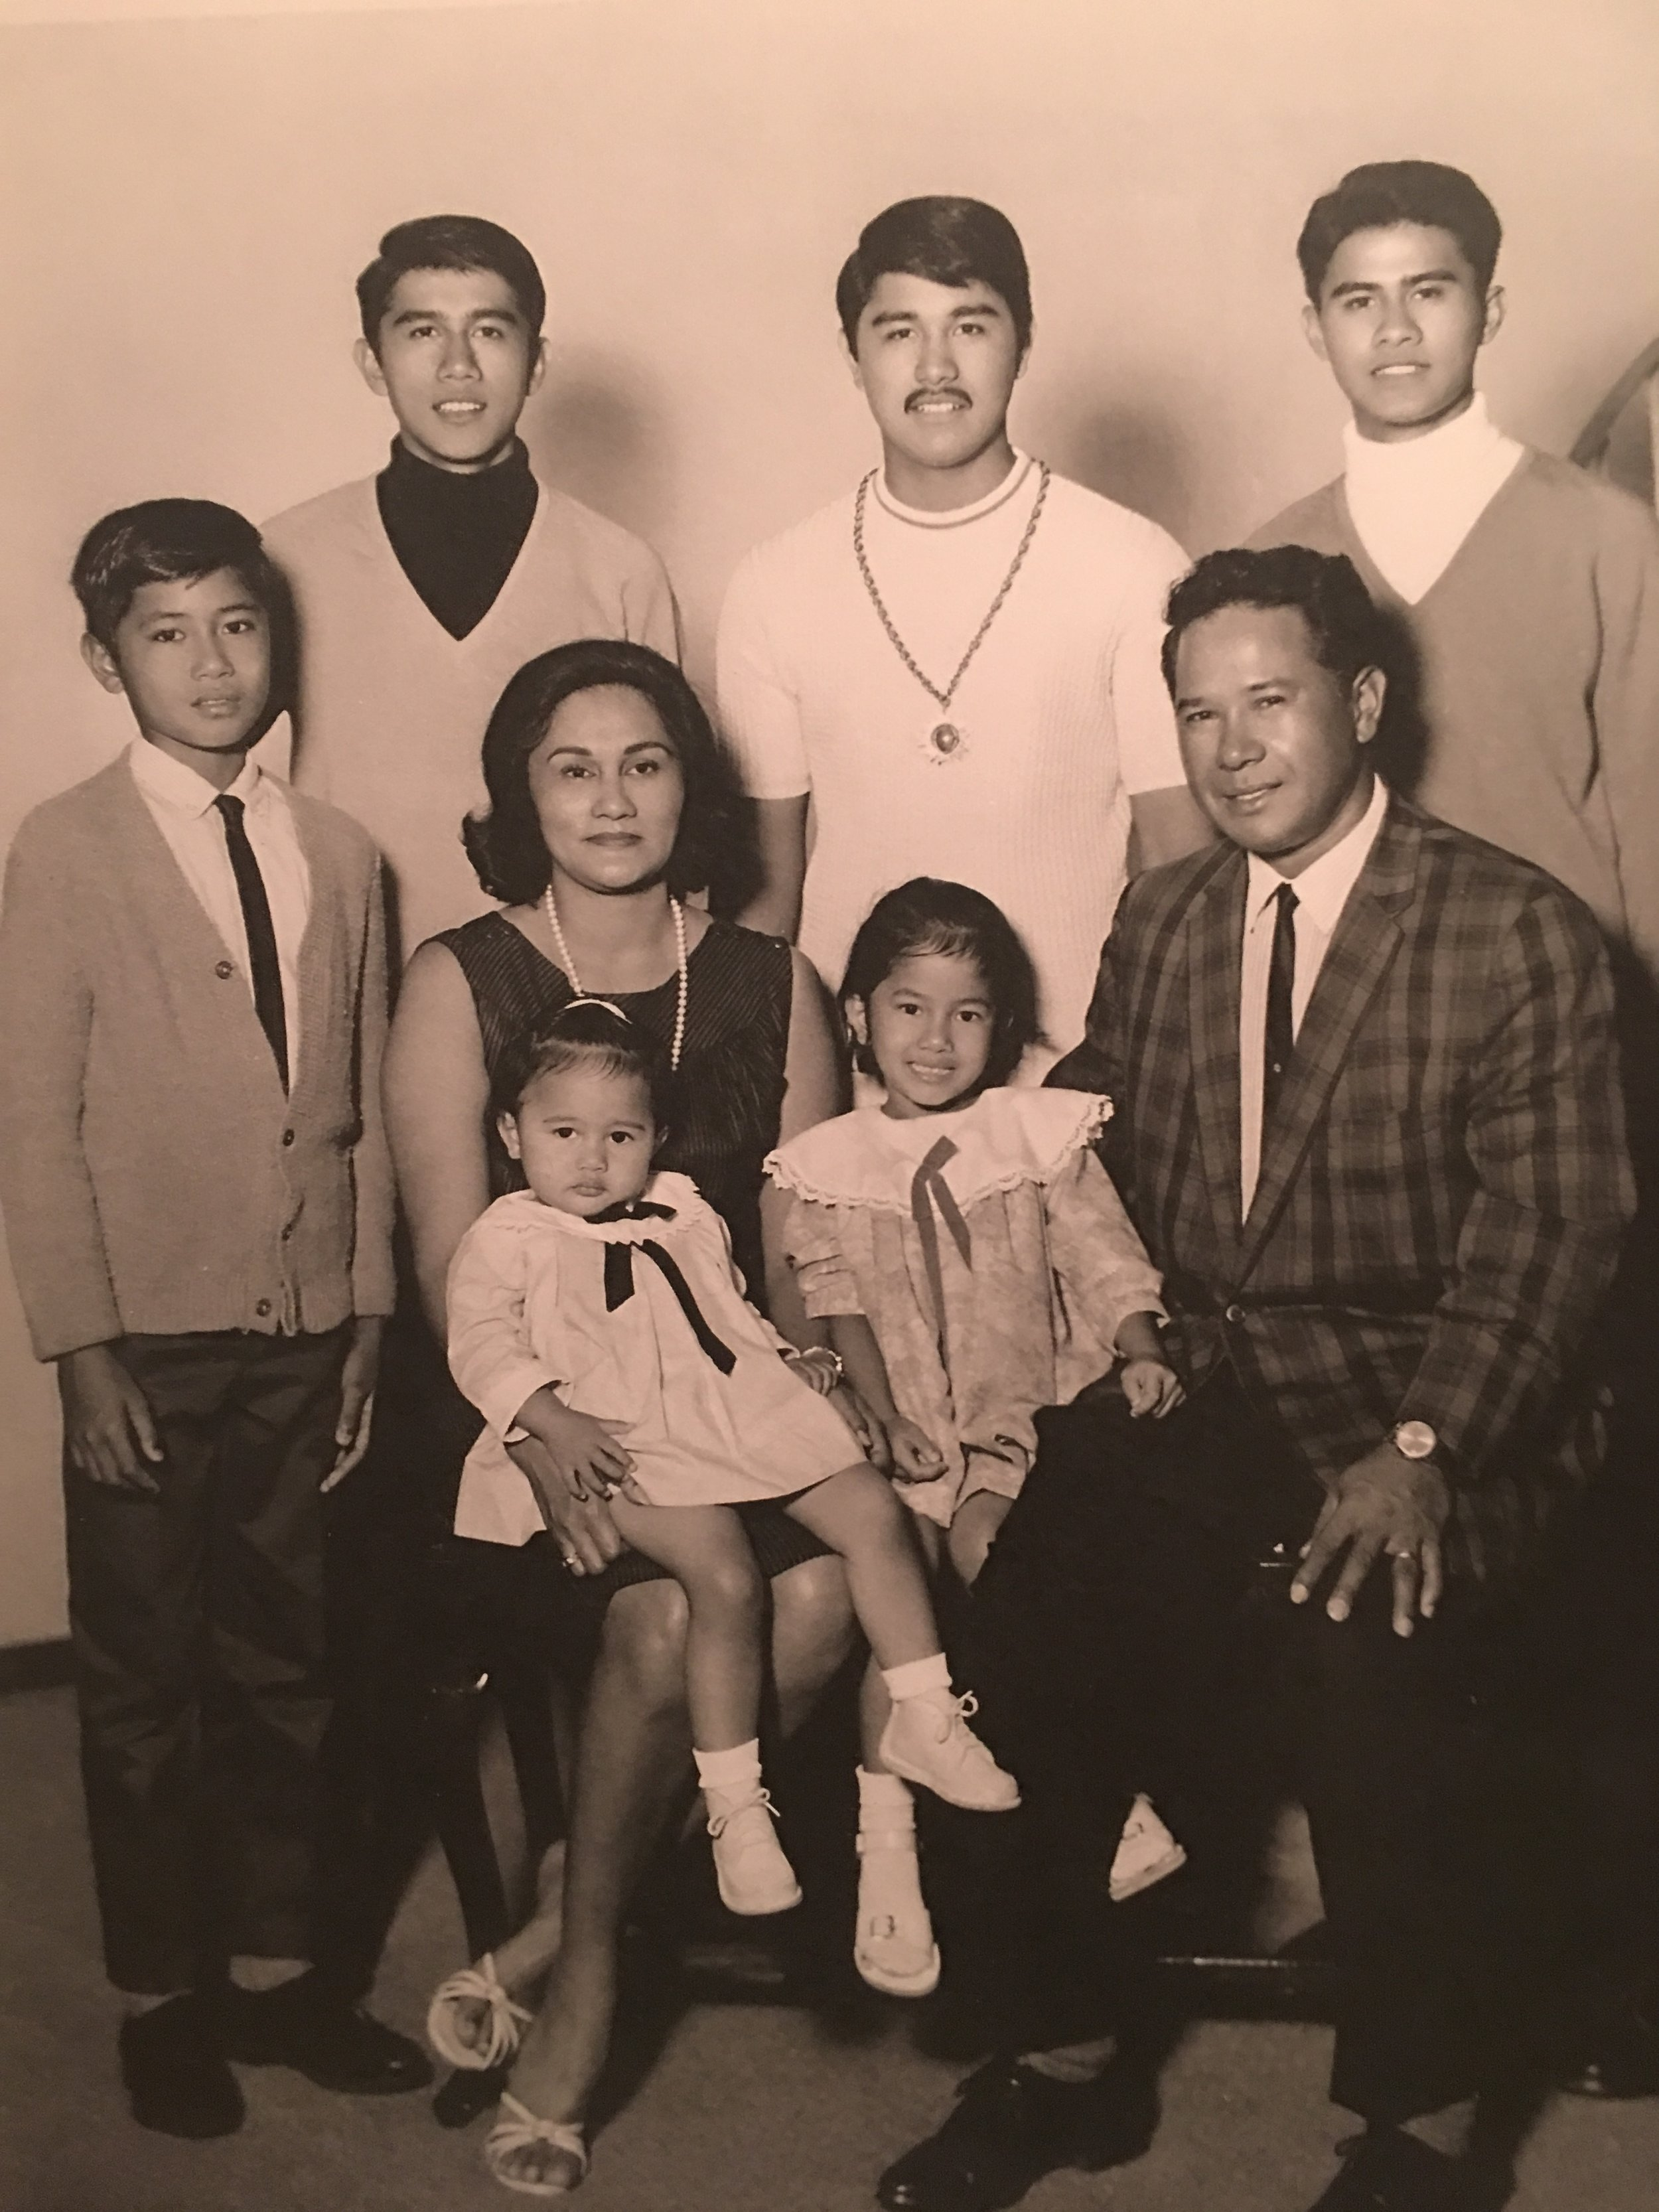 Back (left to right): Paul Bunda, Sandy Bunda, Jr., Bobby Bunda; Front (left to right): Mark Bunda, Esther Bunda (Mom), Sandilee Bunda, Tonilyn Bunda, Sandy Bunda (Dad)